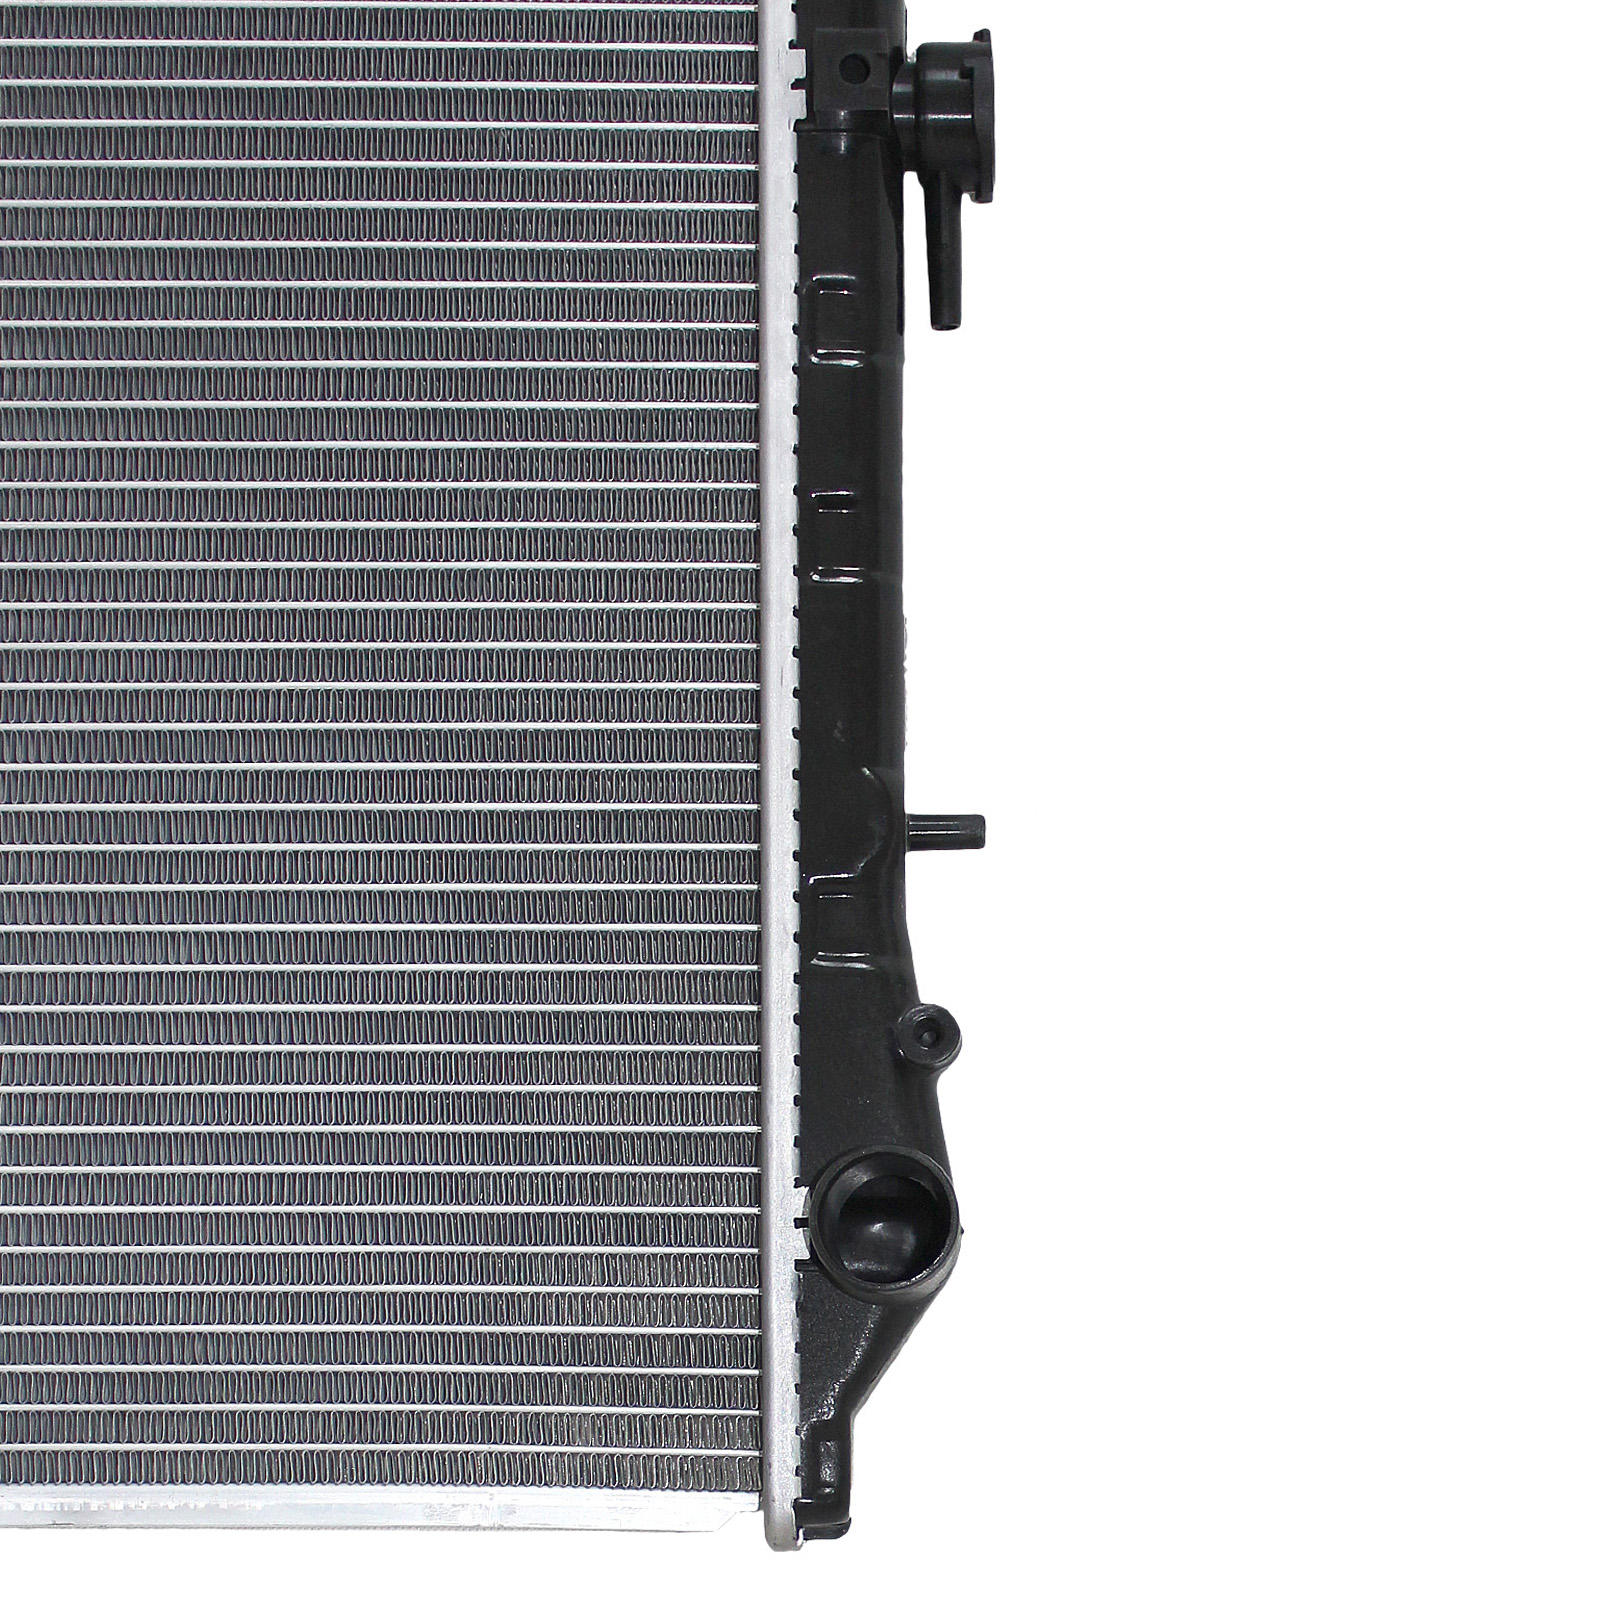 New Radiator For 90-96 Nissan 300ZX 3.0L V6 OEM 21460-30P10